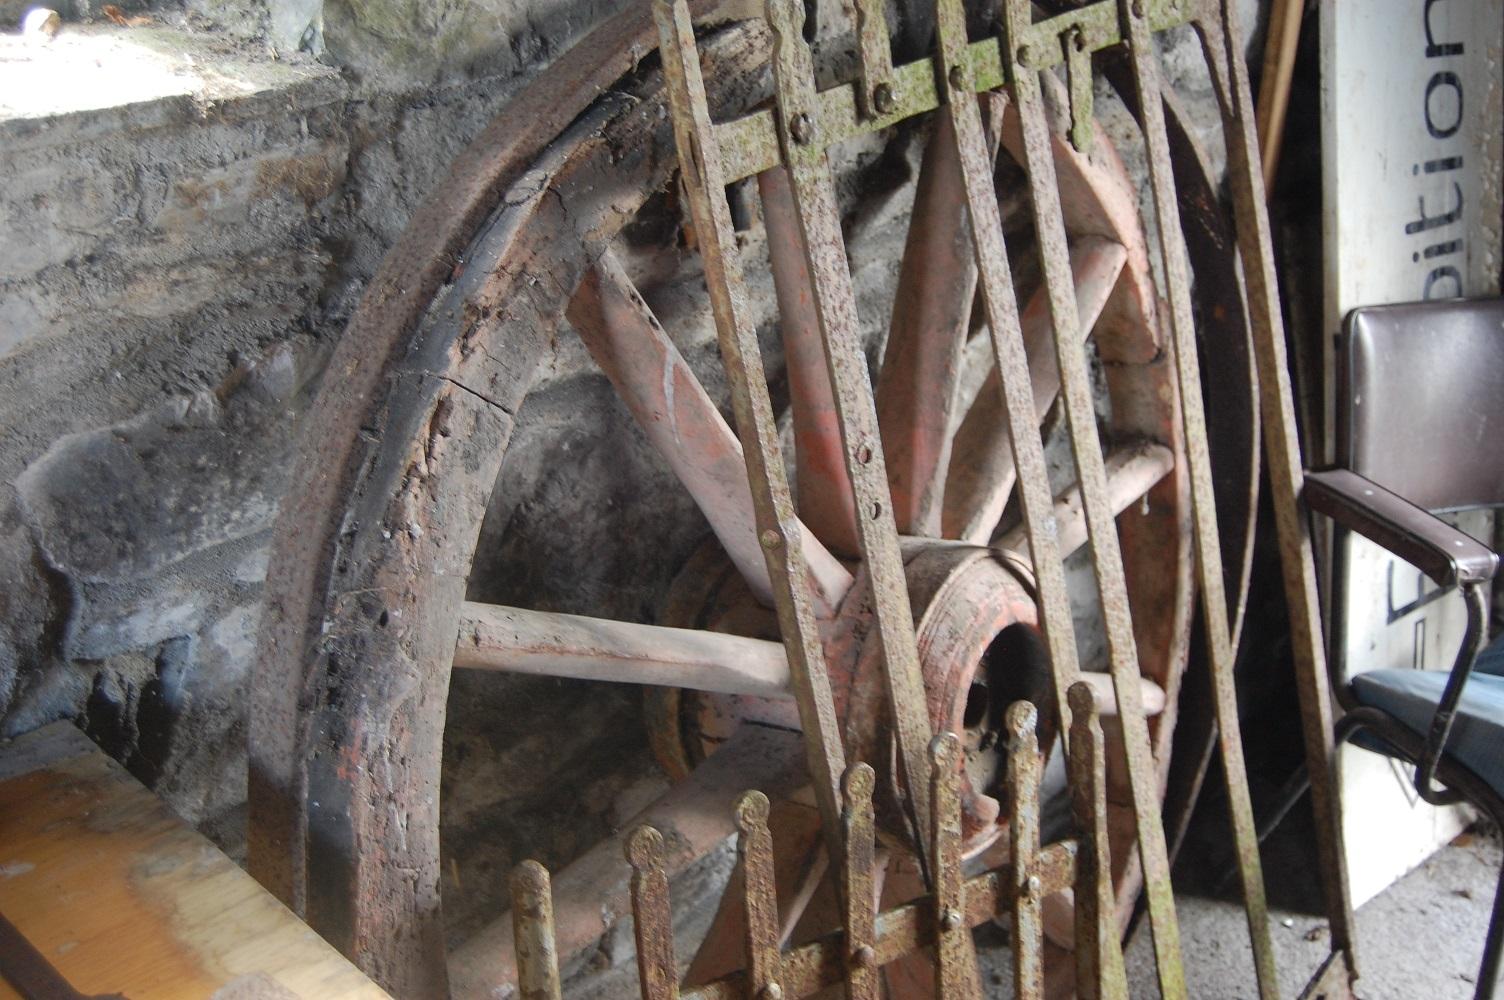 Blacksmith's work